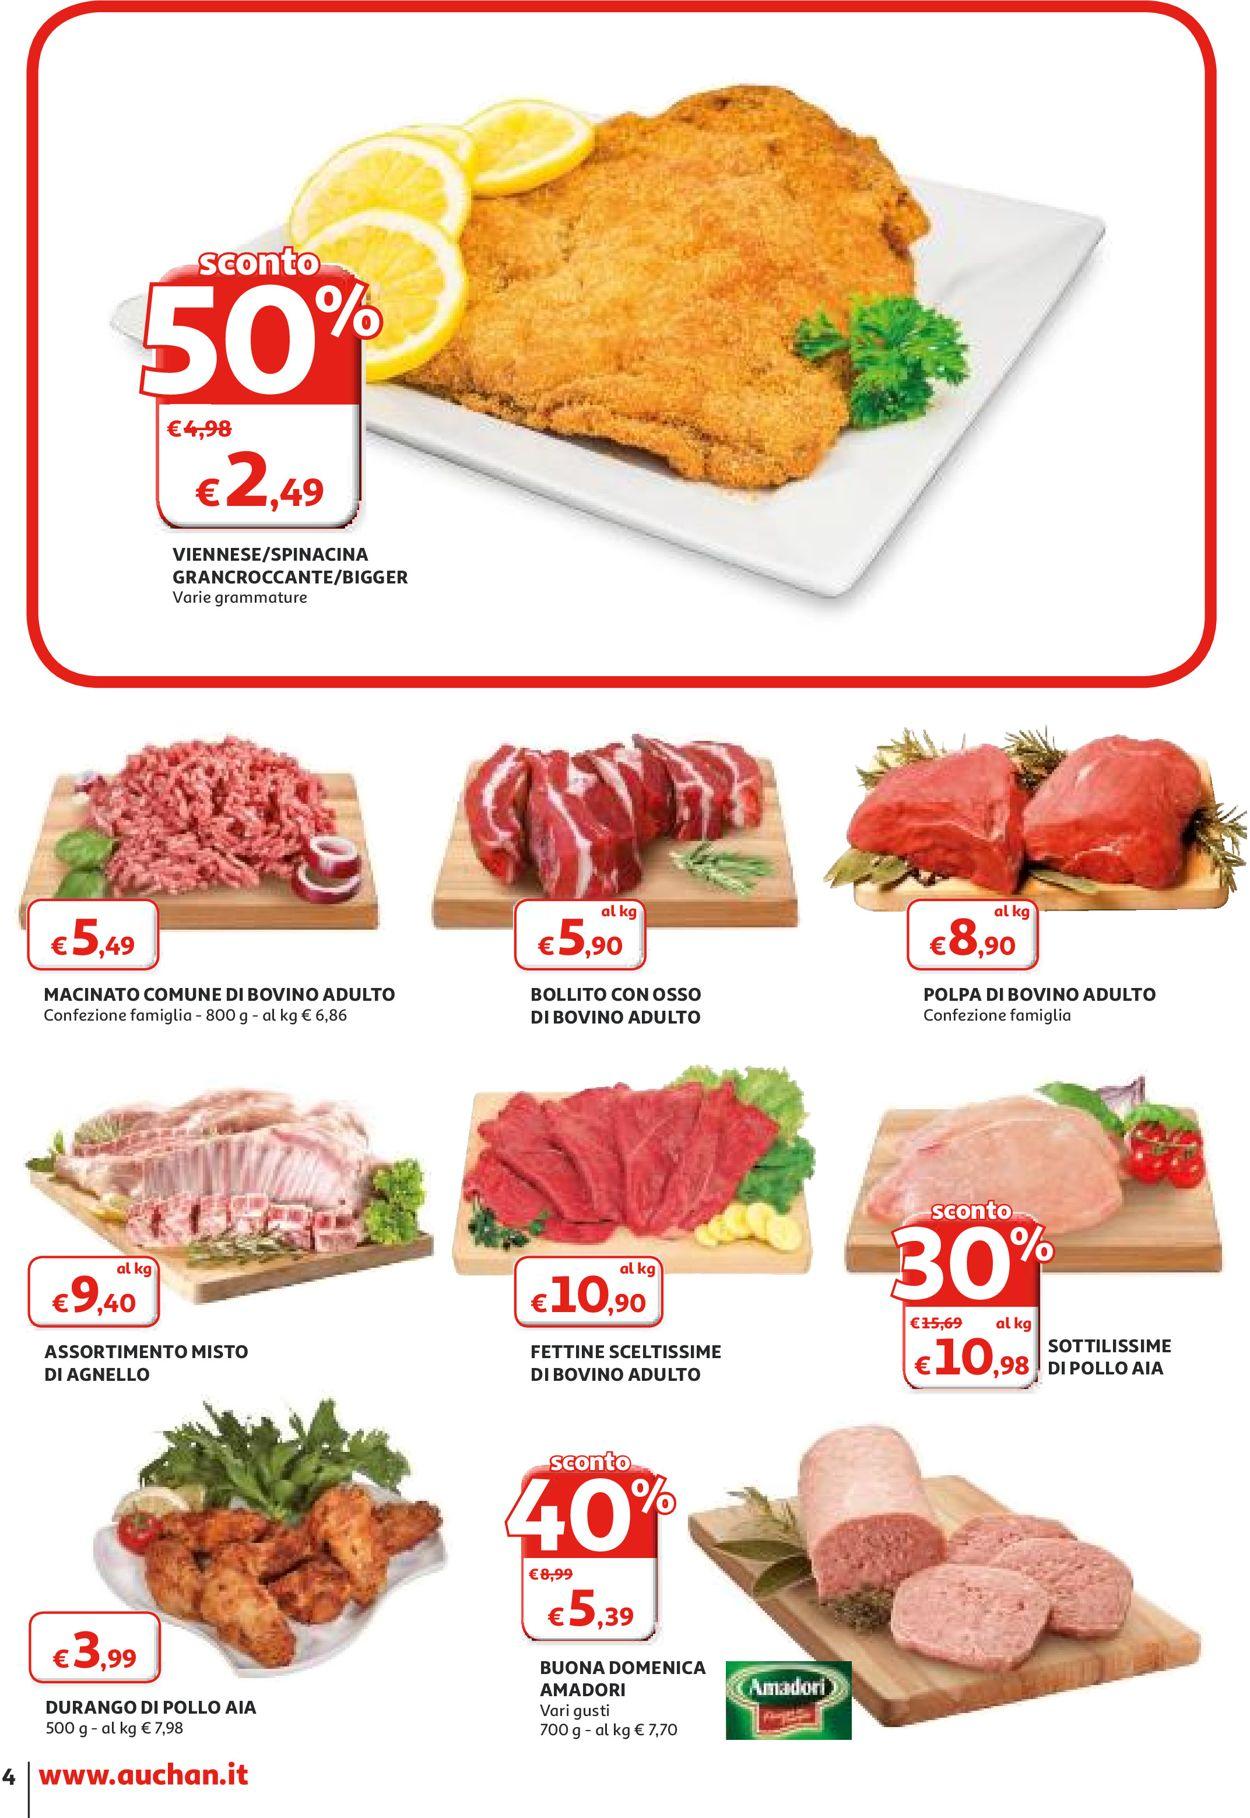 Volantino Auchan - Offerte 06/02-16/02/2020 (Pagina 4)